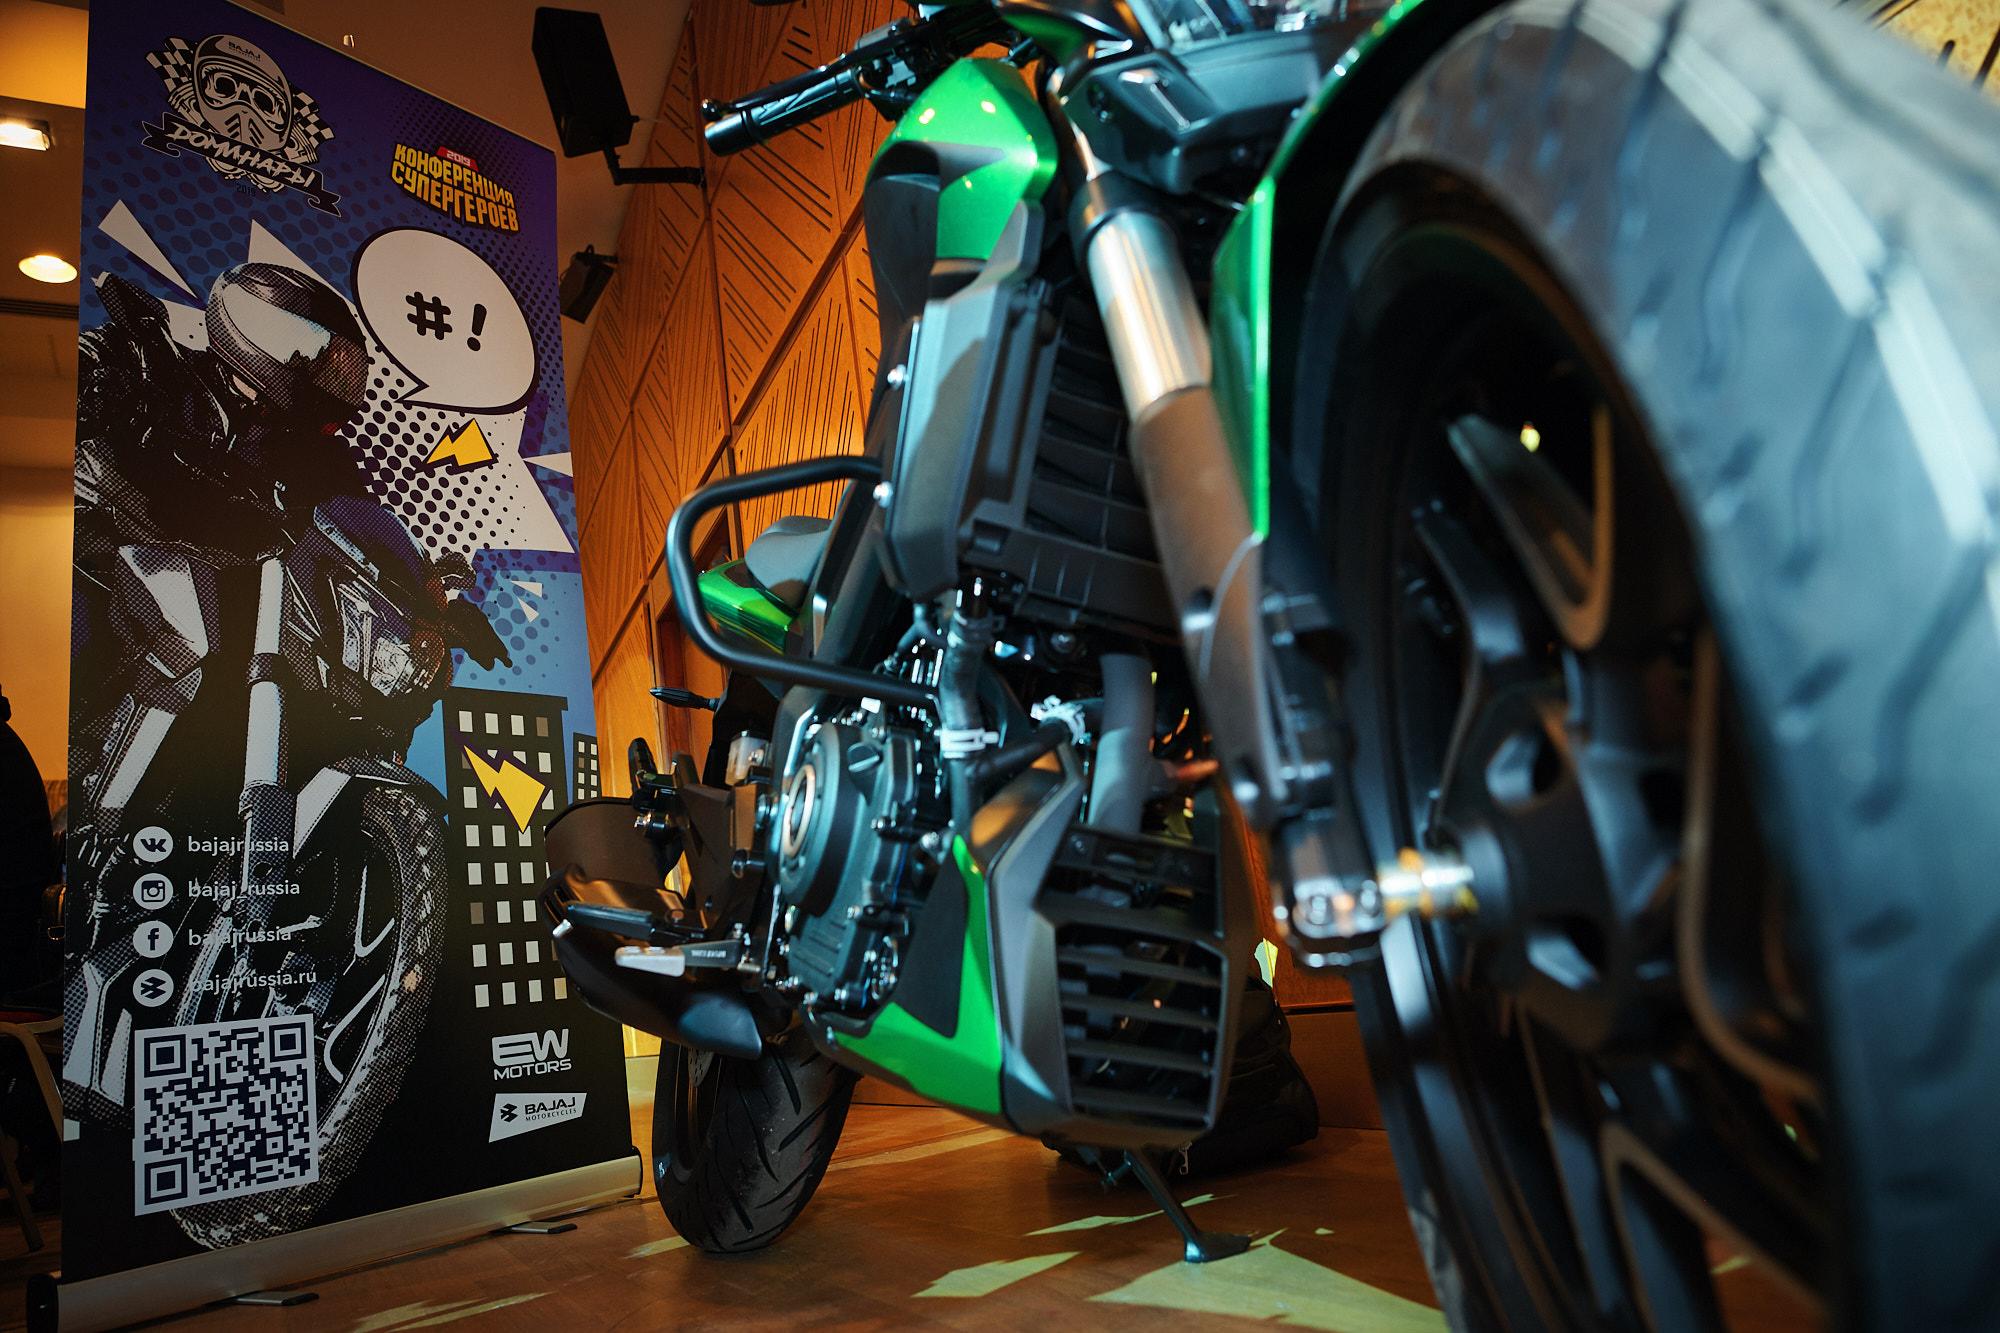 мотоцикл BAJAJ Dominar 400 special edition